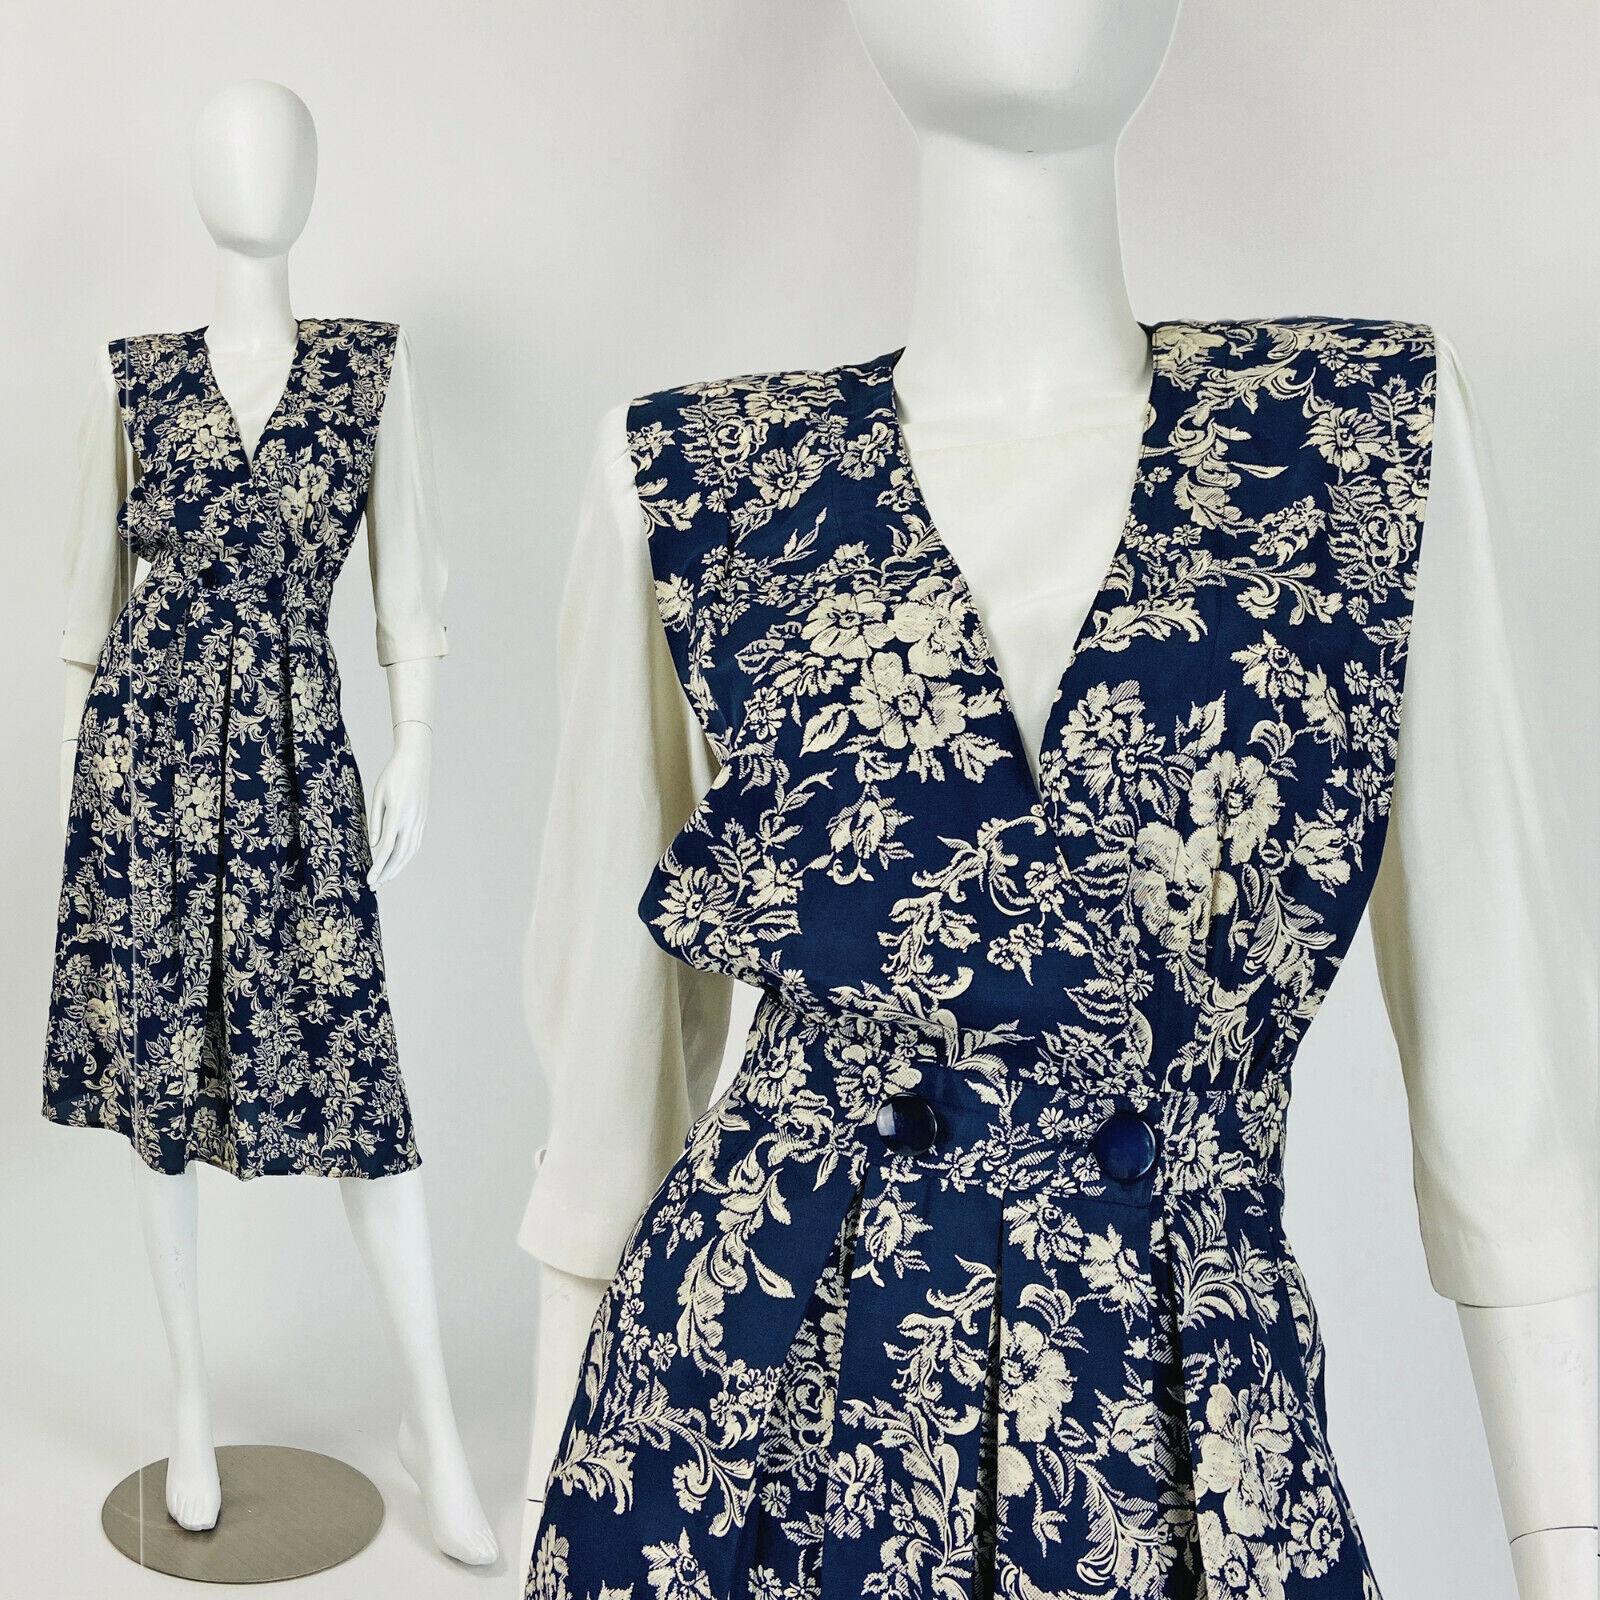 Floral Dress Career Dress Size 6 8 US 10 12 UK B282 Navy Blue Dress Shoulder Pad Dress Small Medium Vintage 80s Secretary Dress